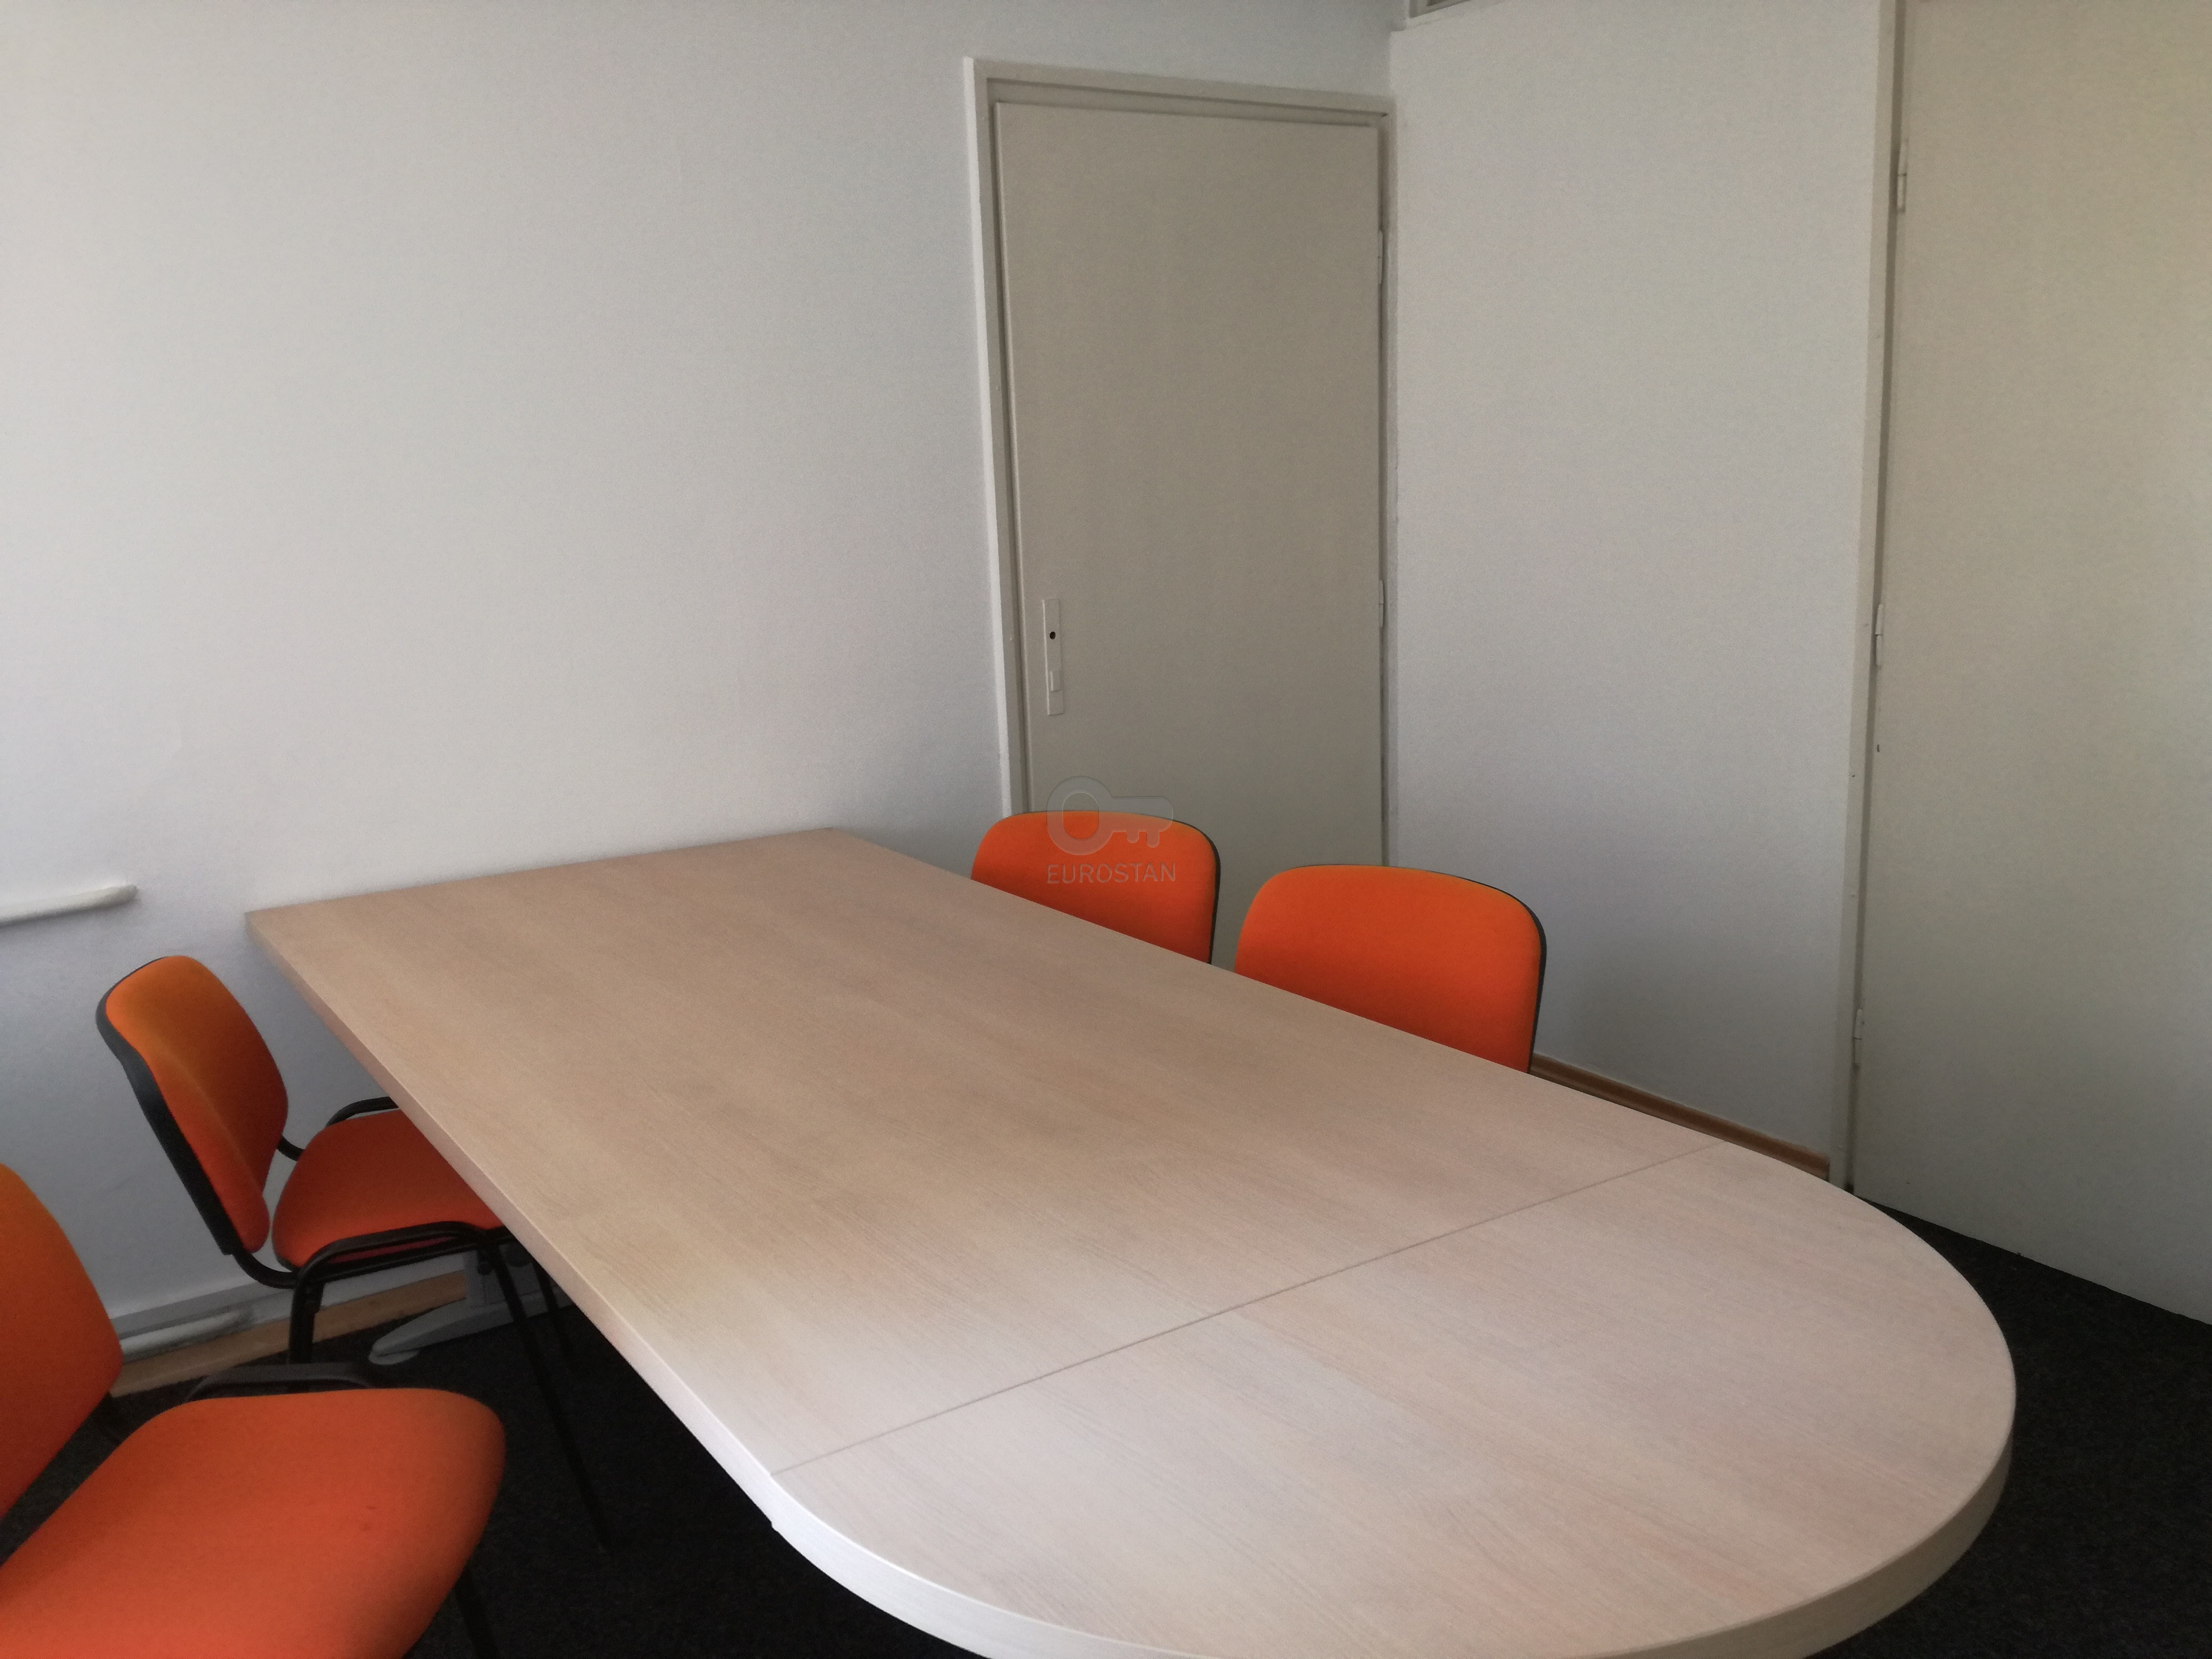 Poslovni prostor SLAVIJA 550 EUR